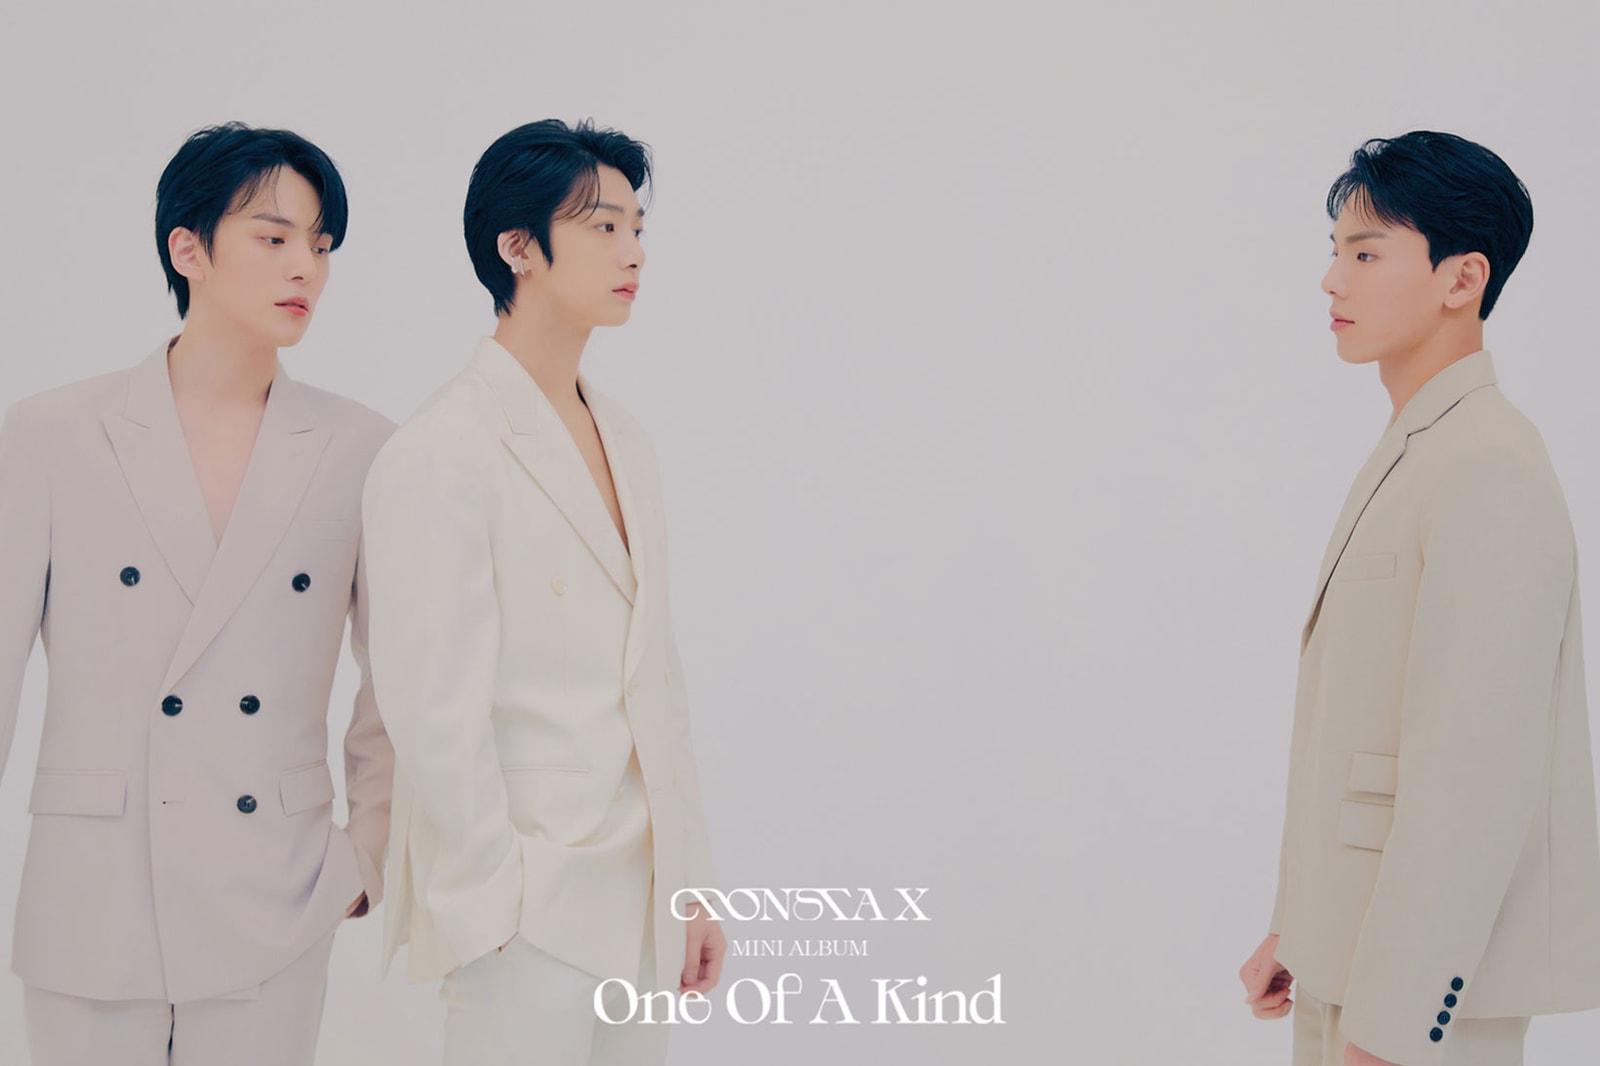 monsta x one of a kind album gambler addicted music video release k-pop interview hyungwon im joohoney kihyun minhyuk shownu